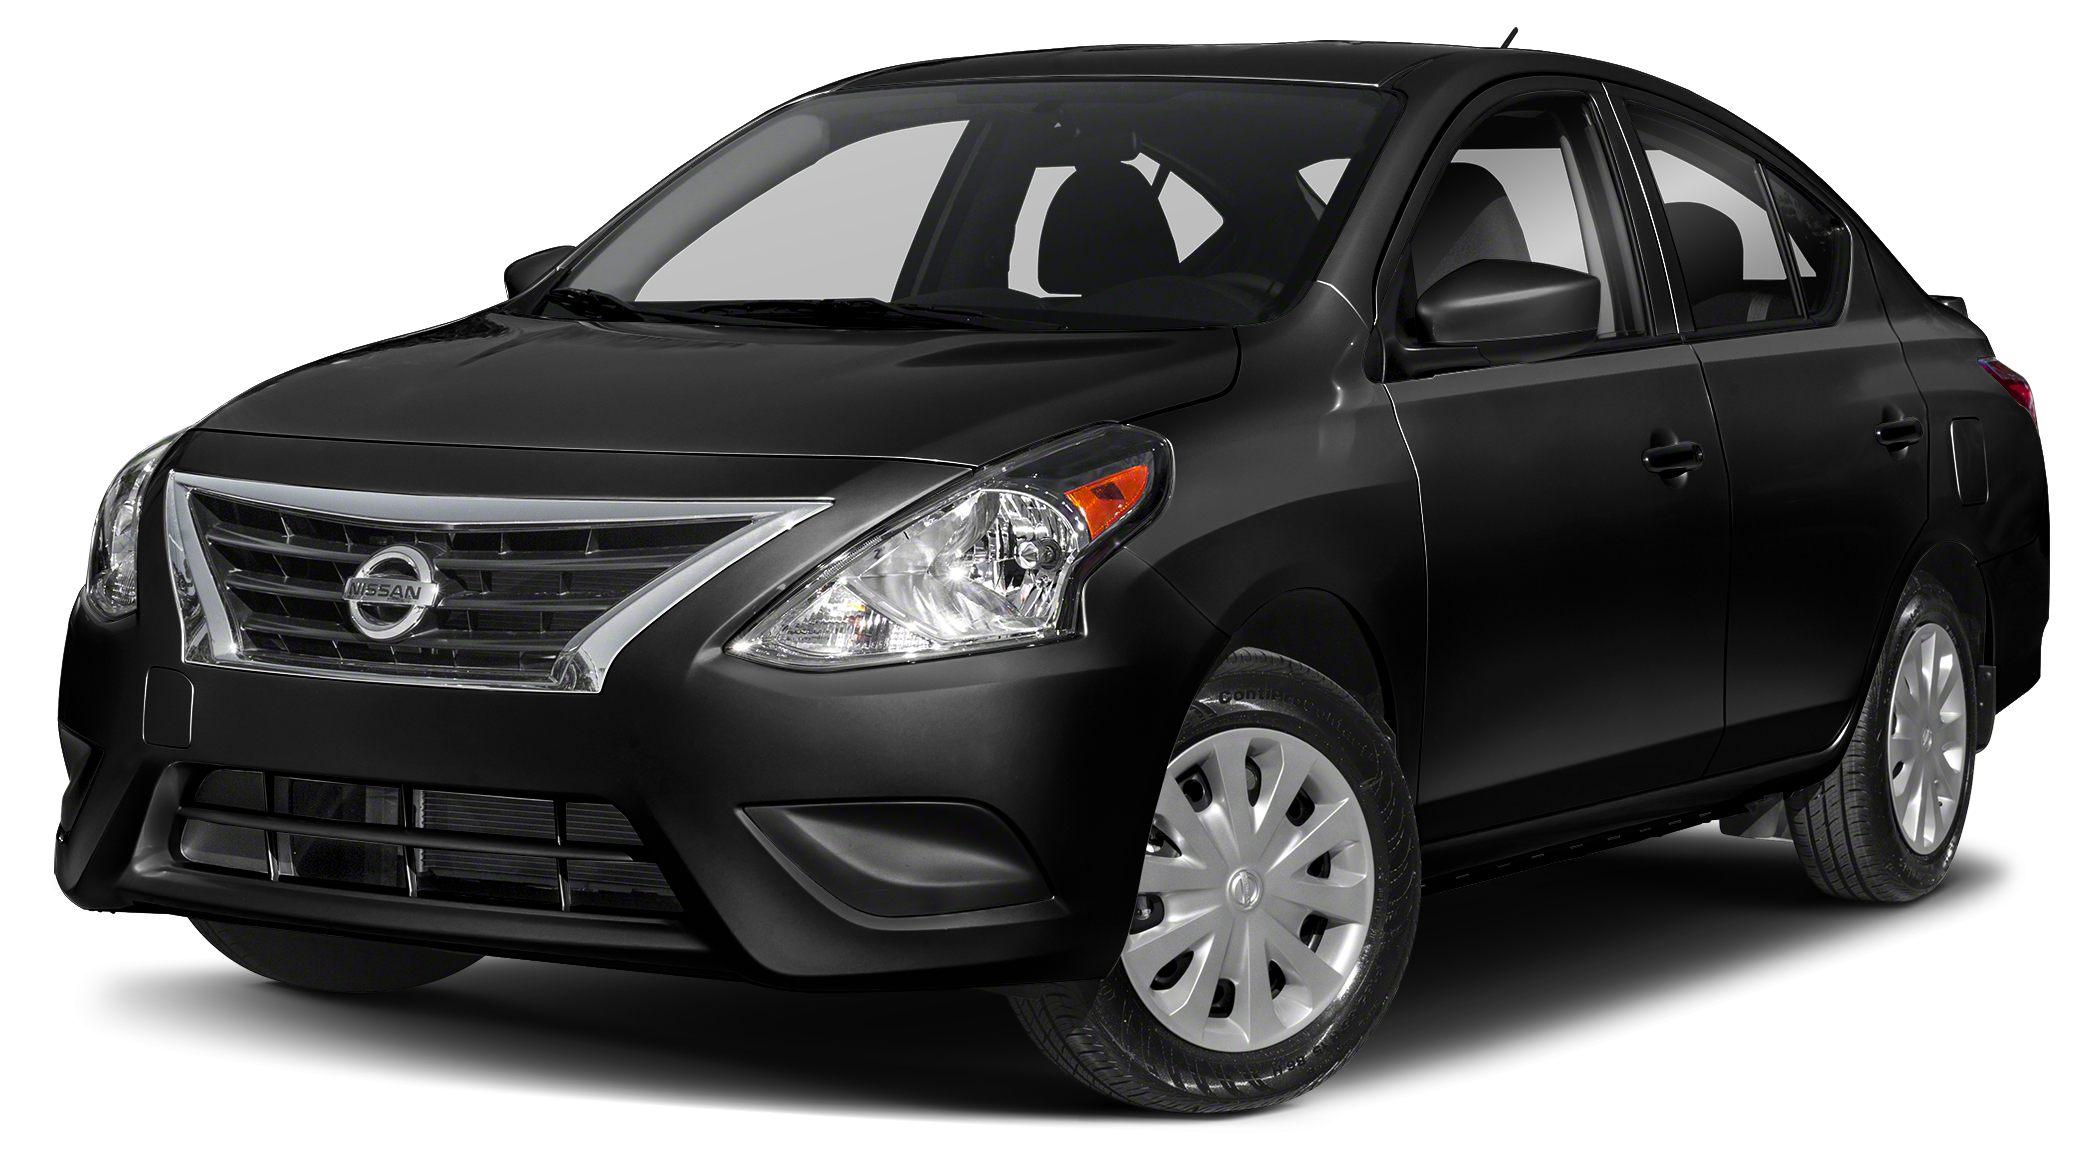 2018 Nissan Versa 16 S Miles 5Color Black Stock 7180519 VIN 3N1CN7AP6JL841072